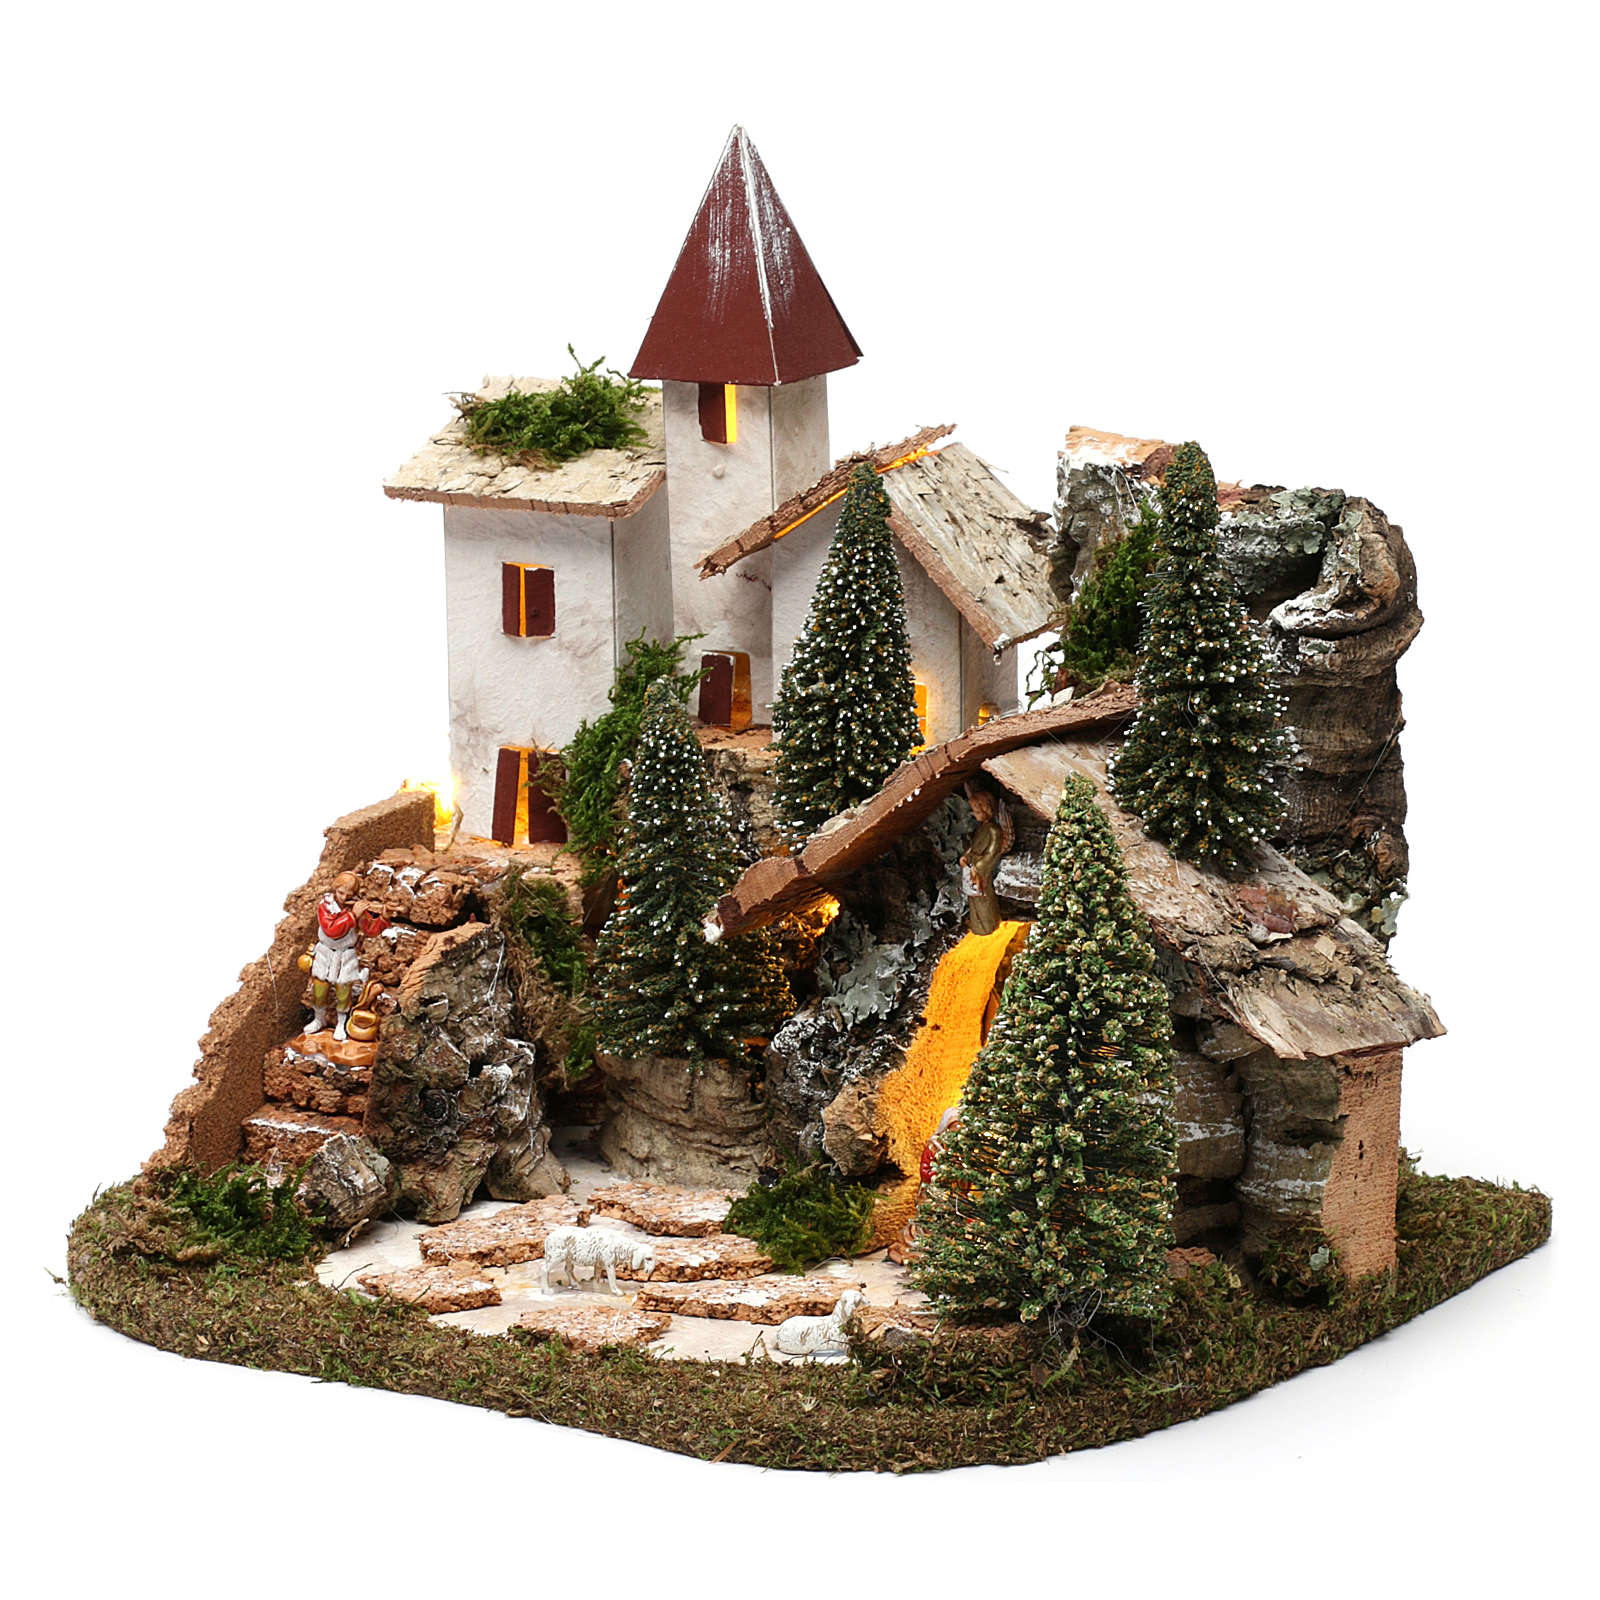 Nordic nativity scene village  20x25x20 cm 4